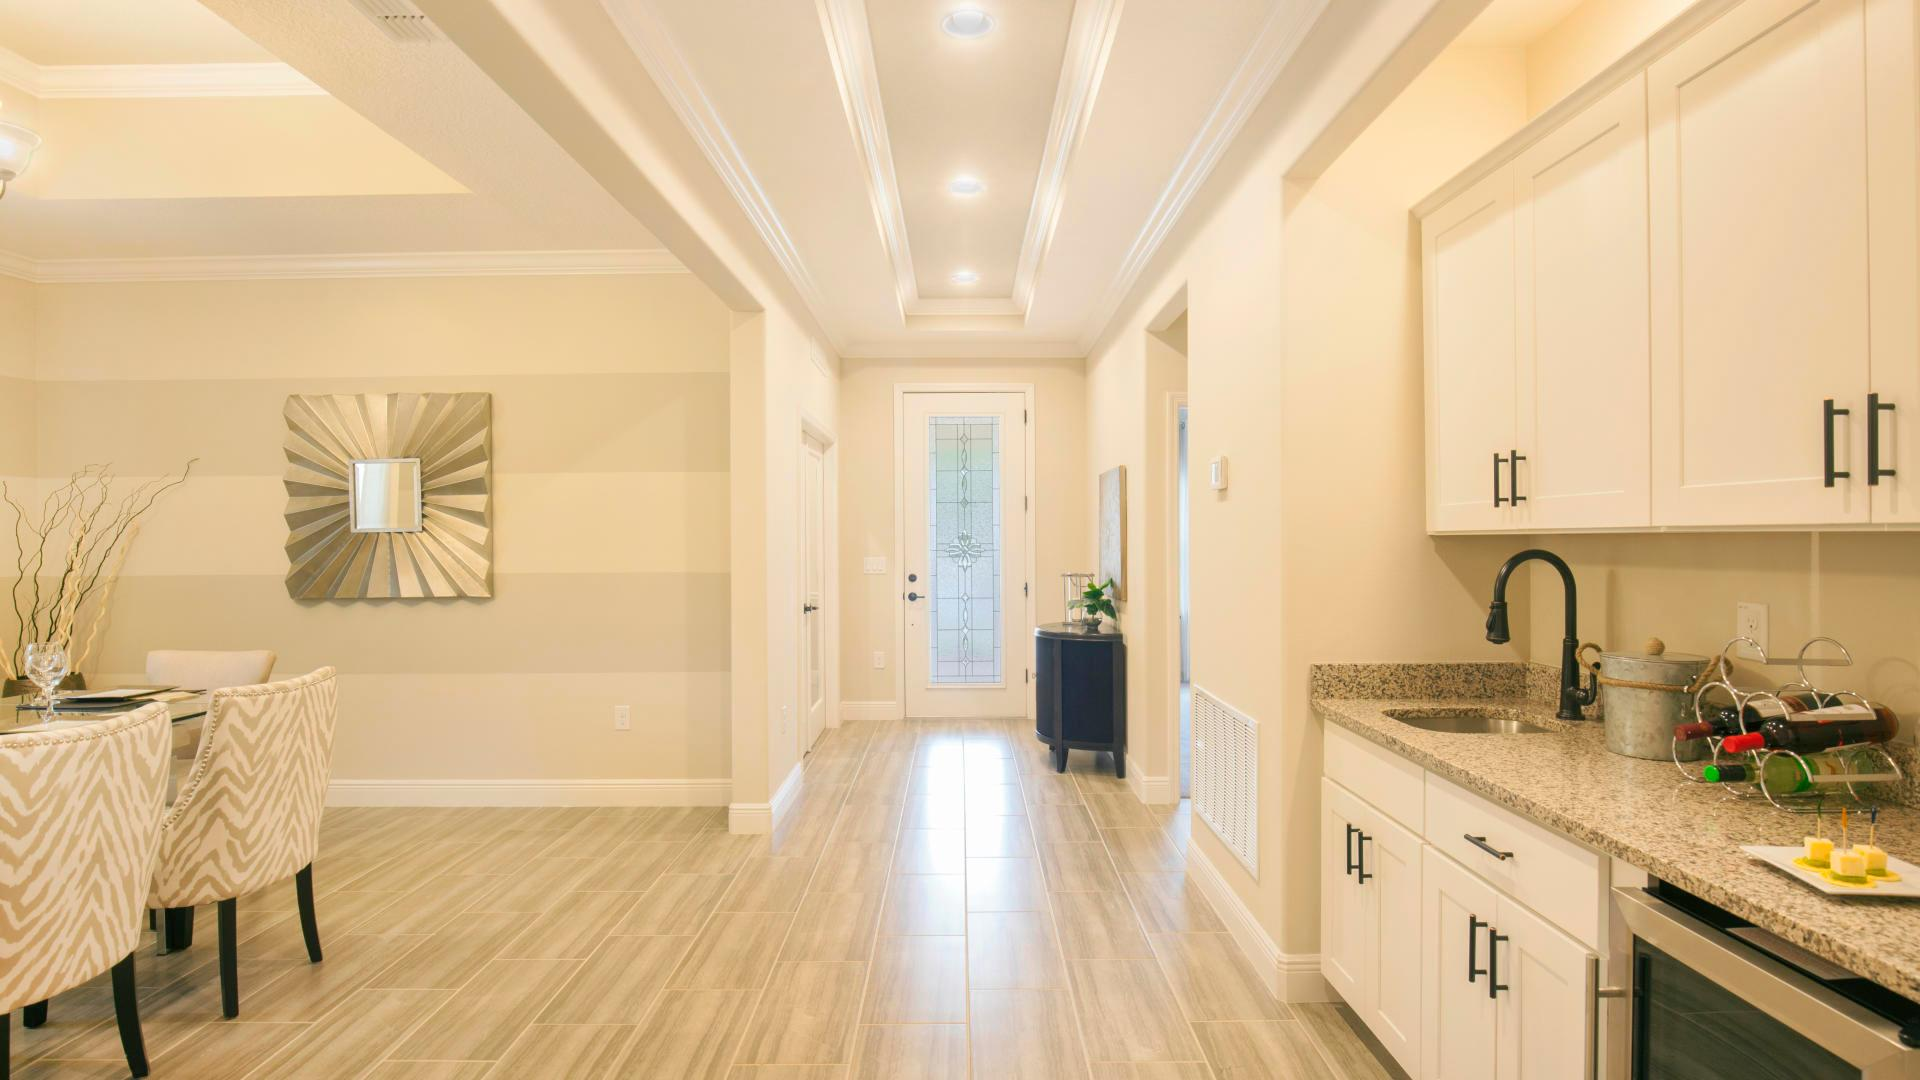 Living Area featured in the Livorno By Maronda Homes in Daytona Beach, FL